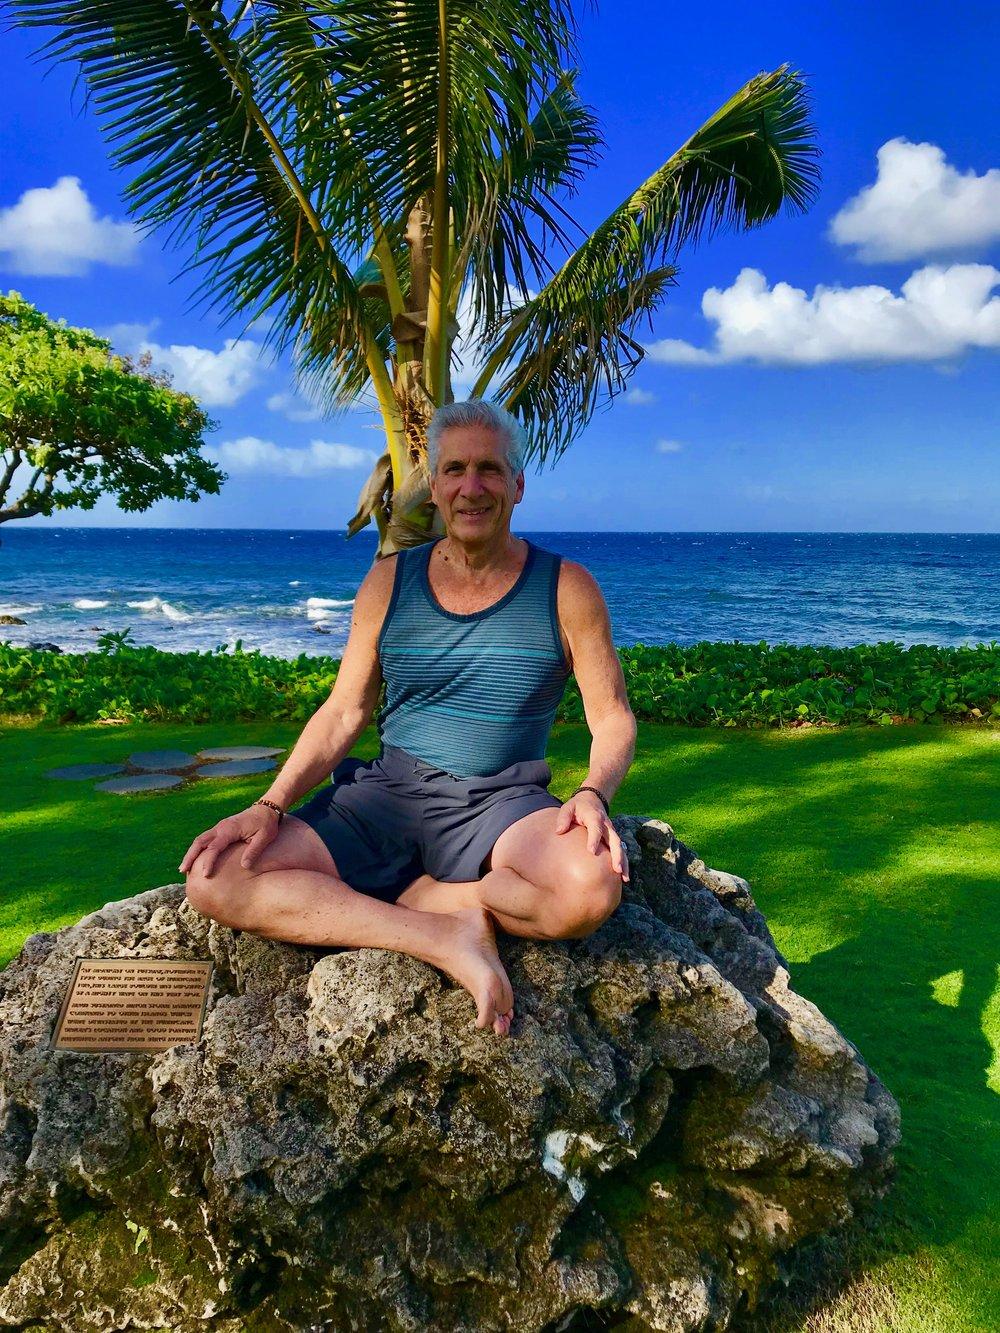 Dennis sitting X leg on Rock under Palm.jpg*.jpg